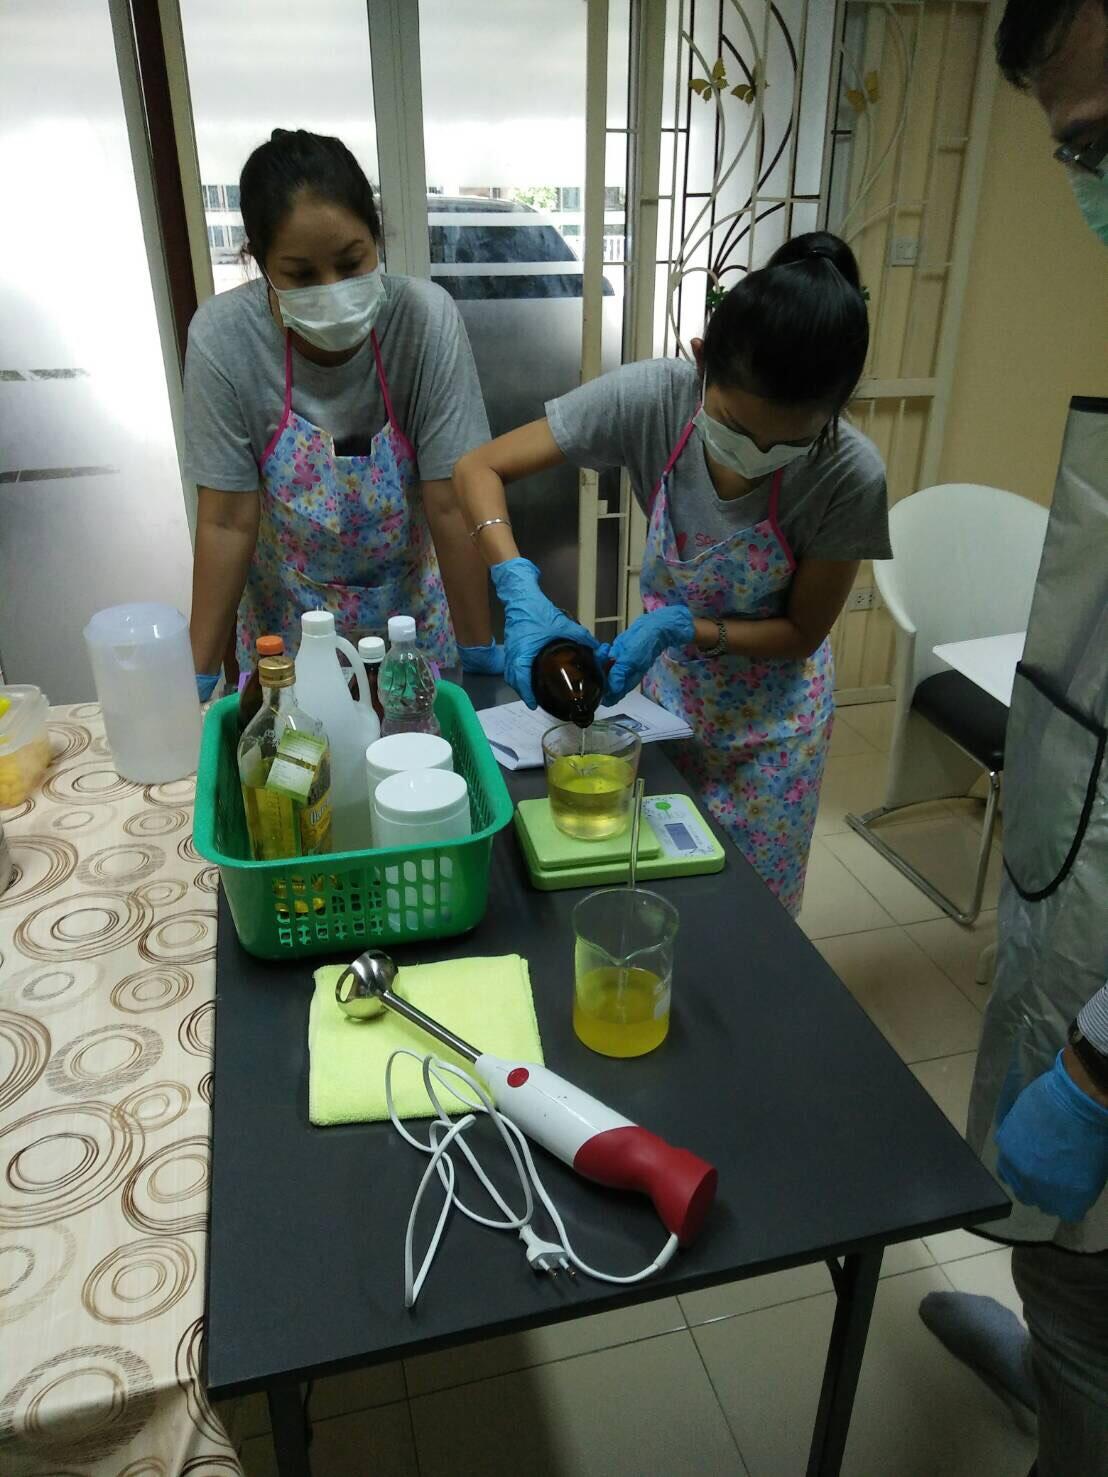 soap maker วิธีทำสบู่ สอนทำสบู่3